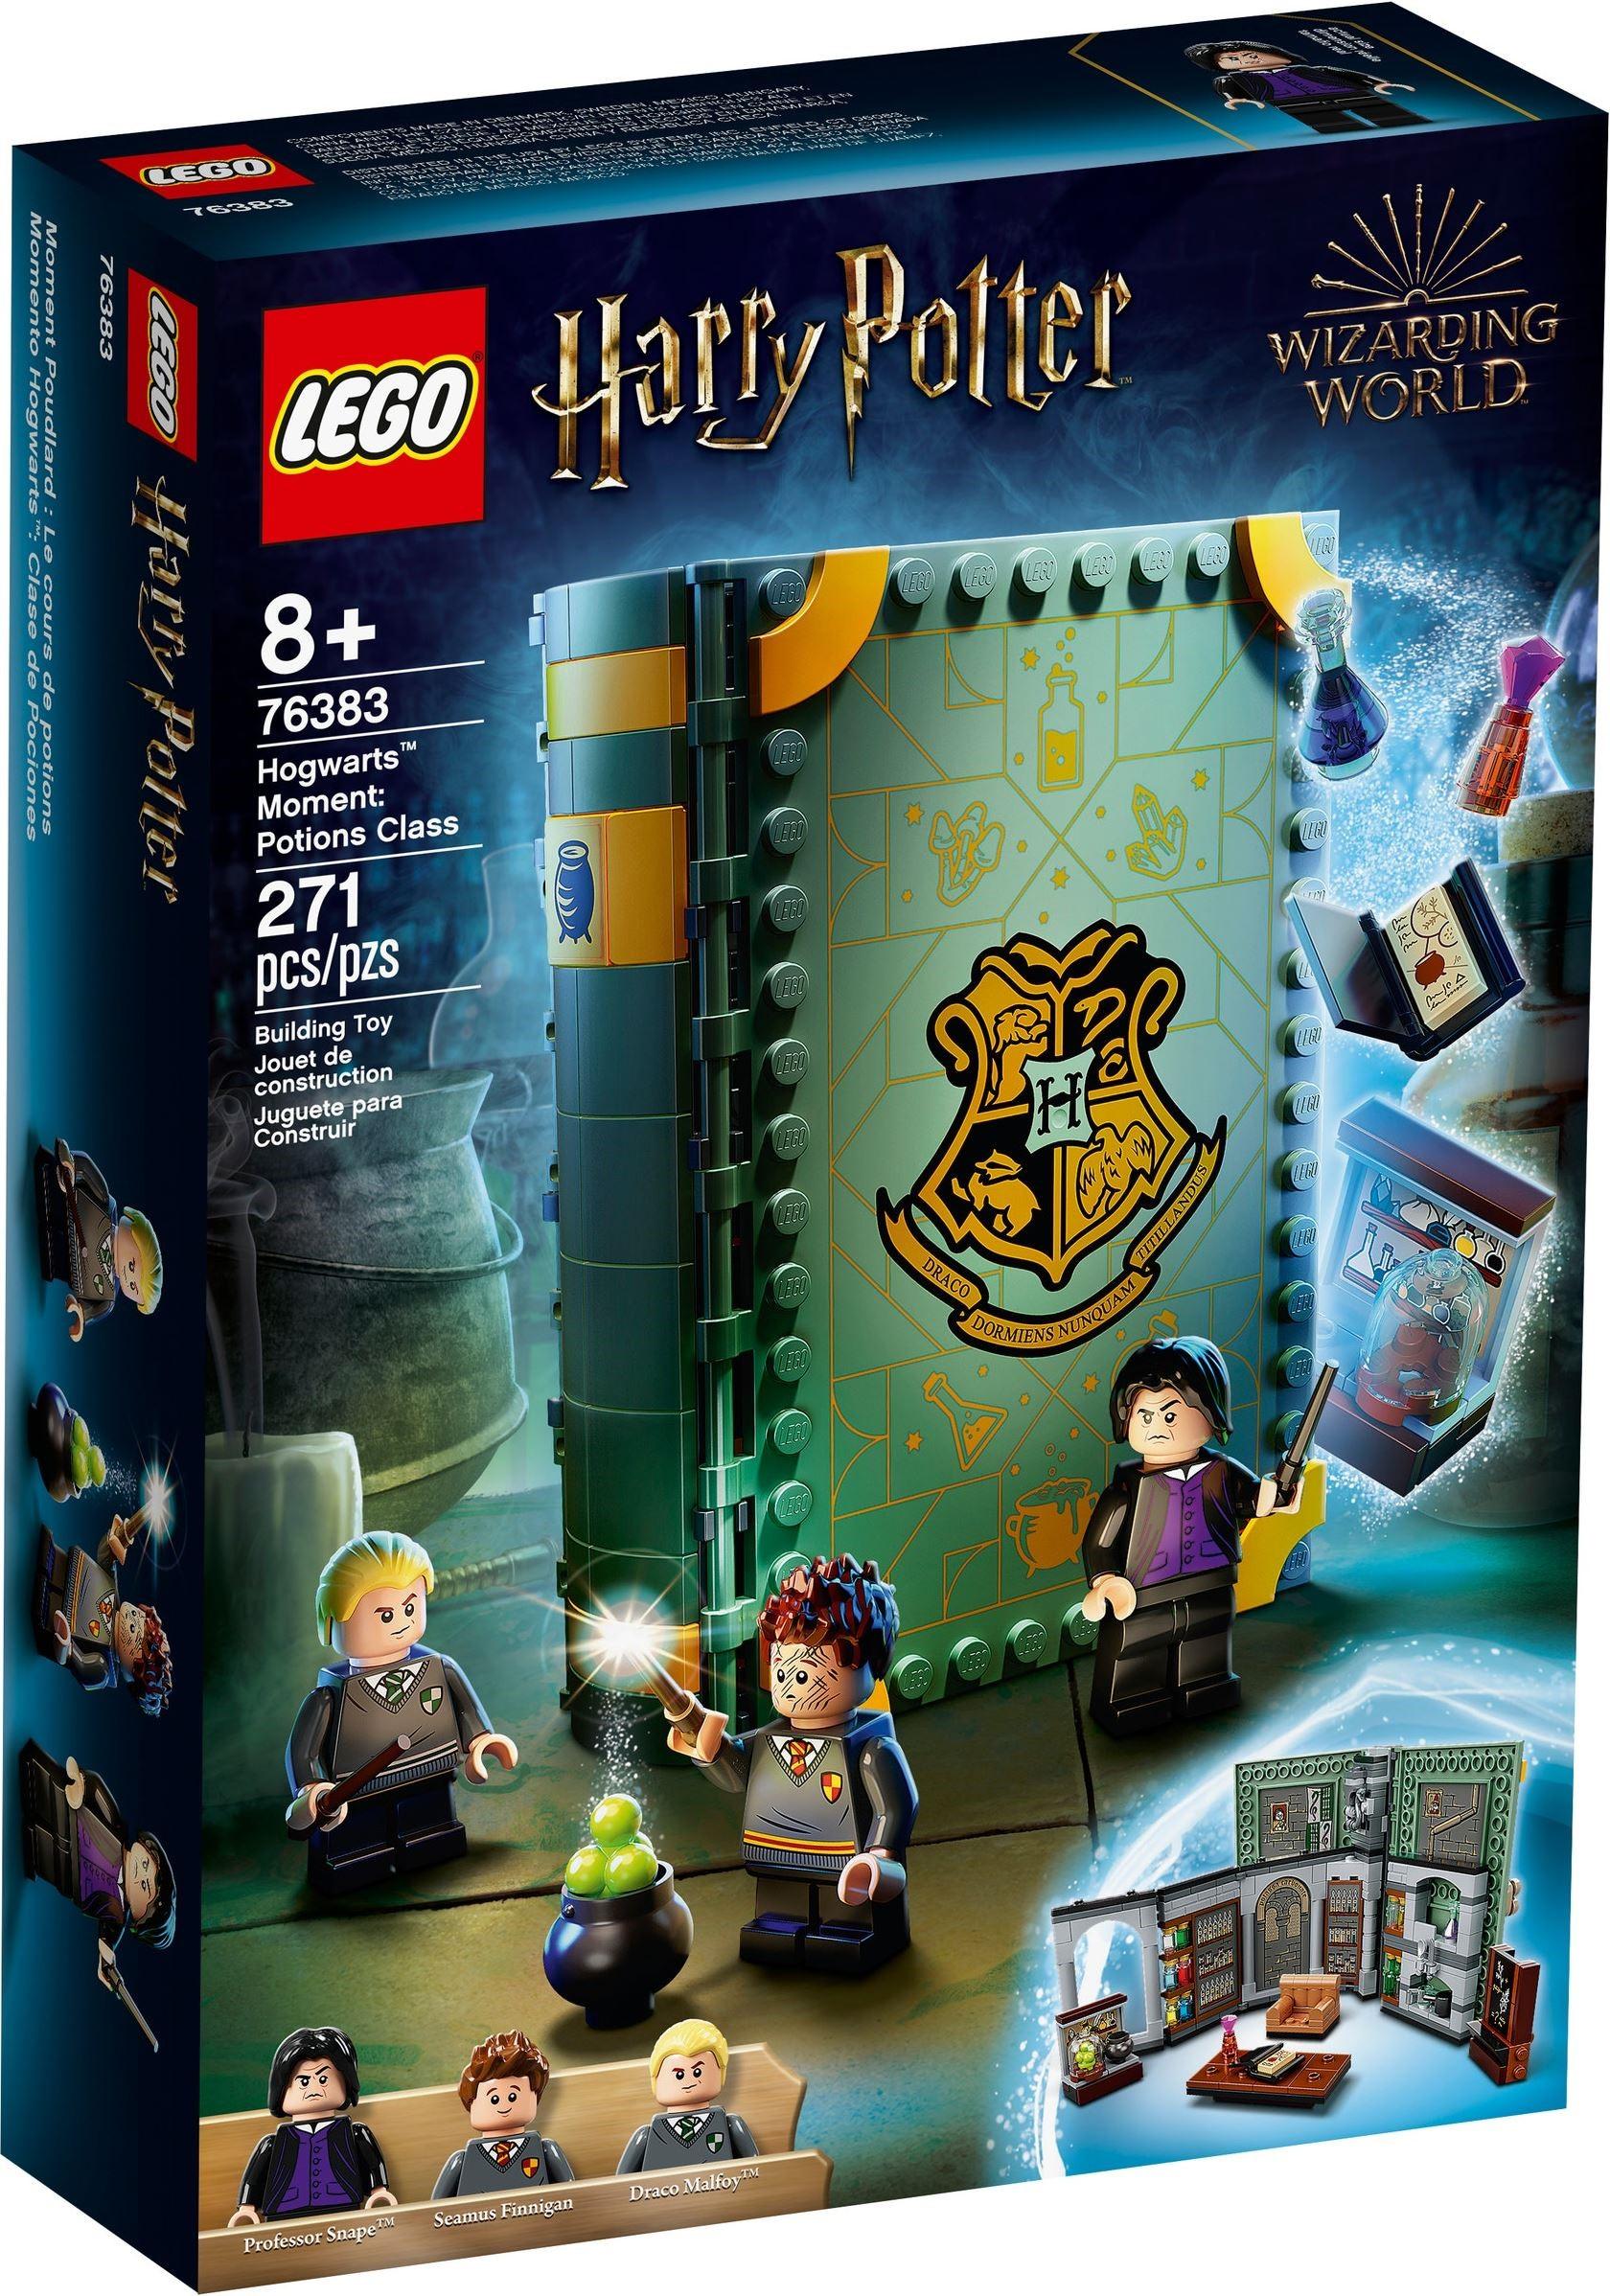 76383 Hogwarts Moment: Potions Class